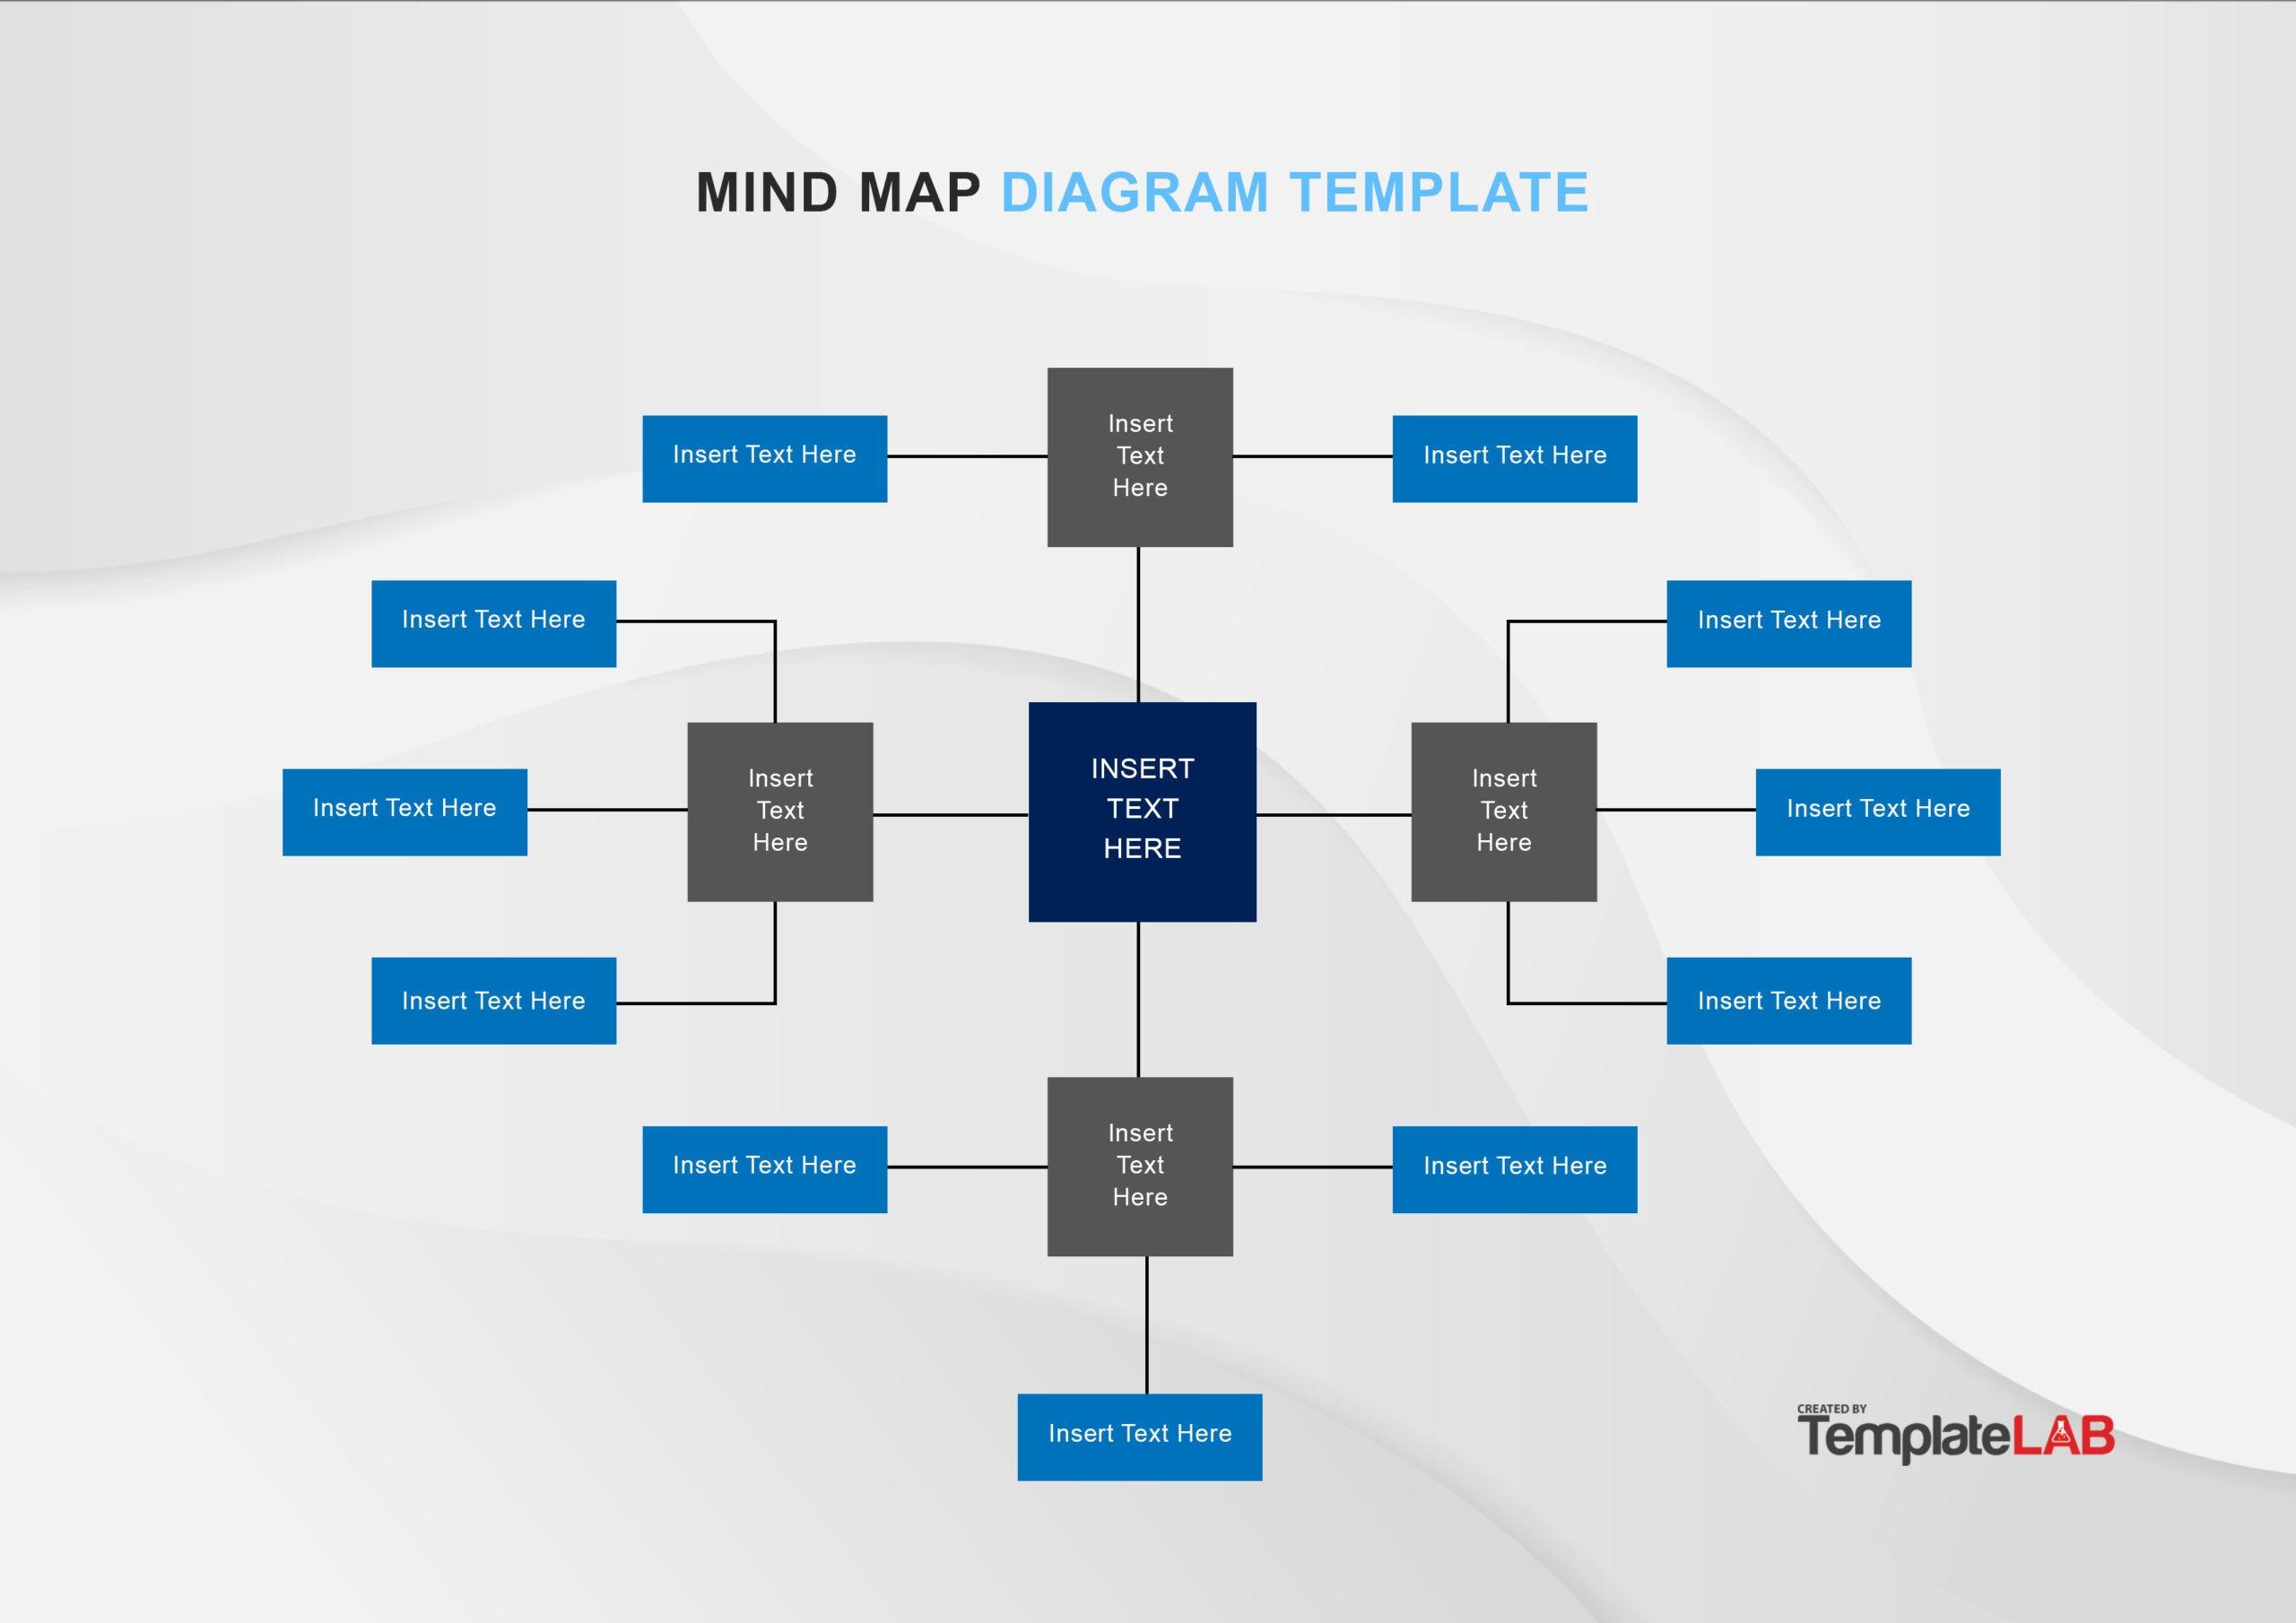 Free Mind Map Template 05 - TemplateLab.com